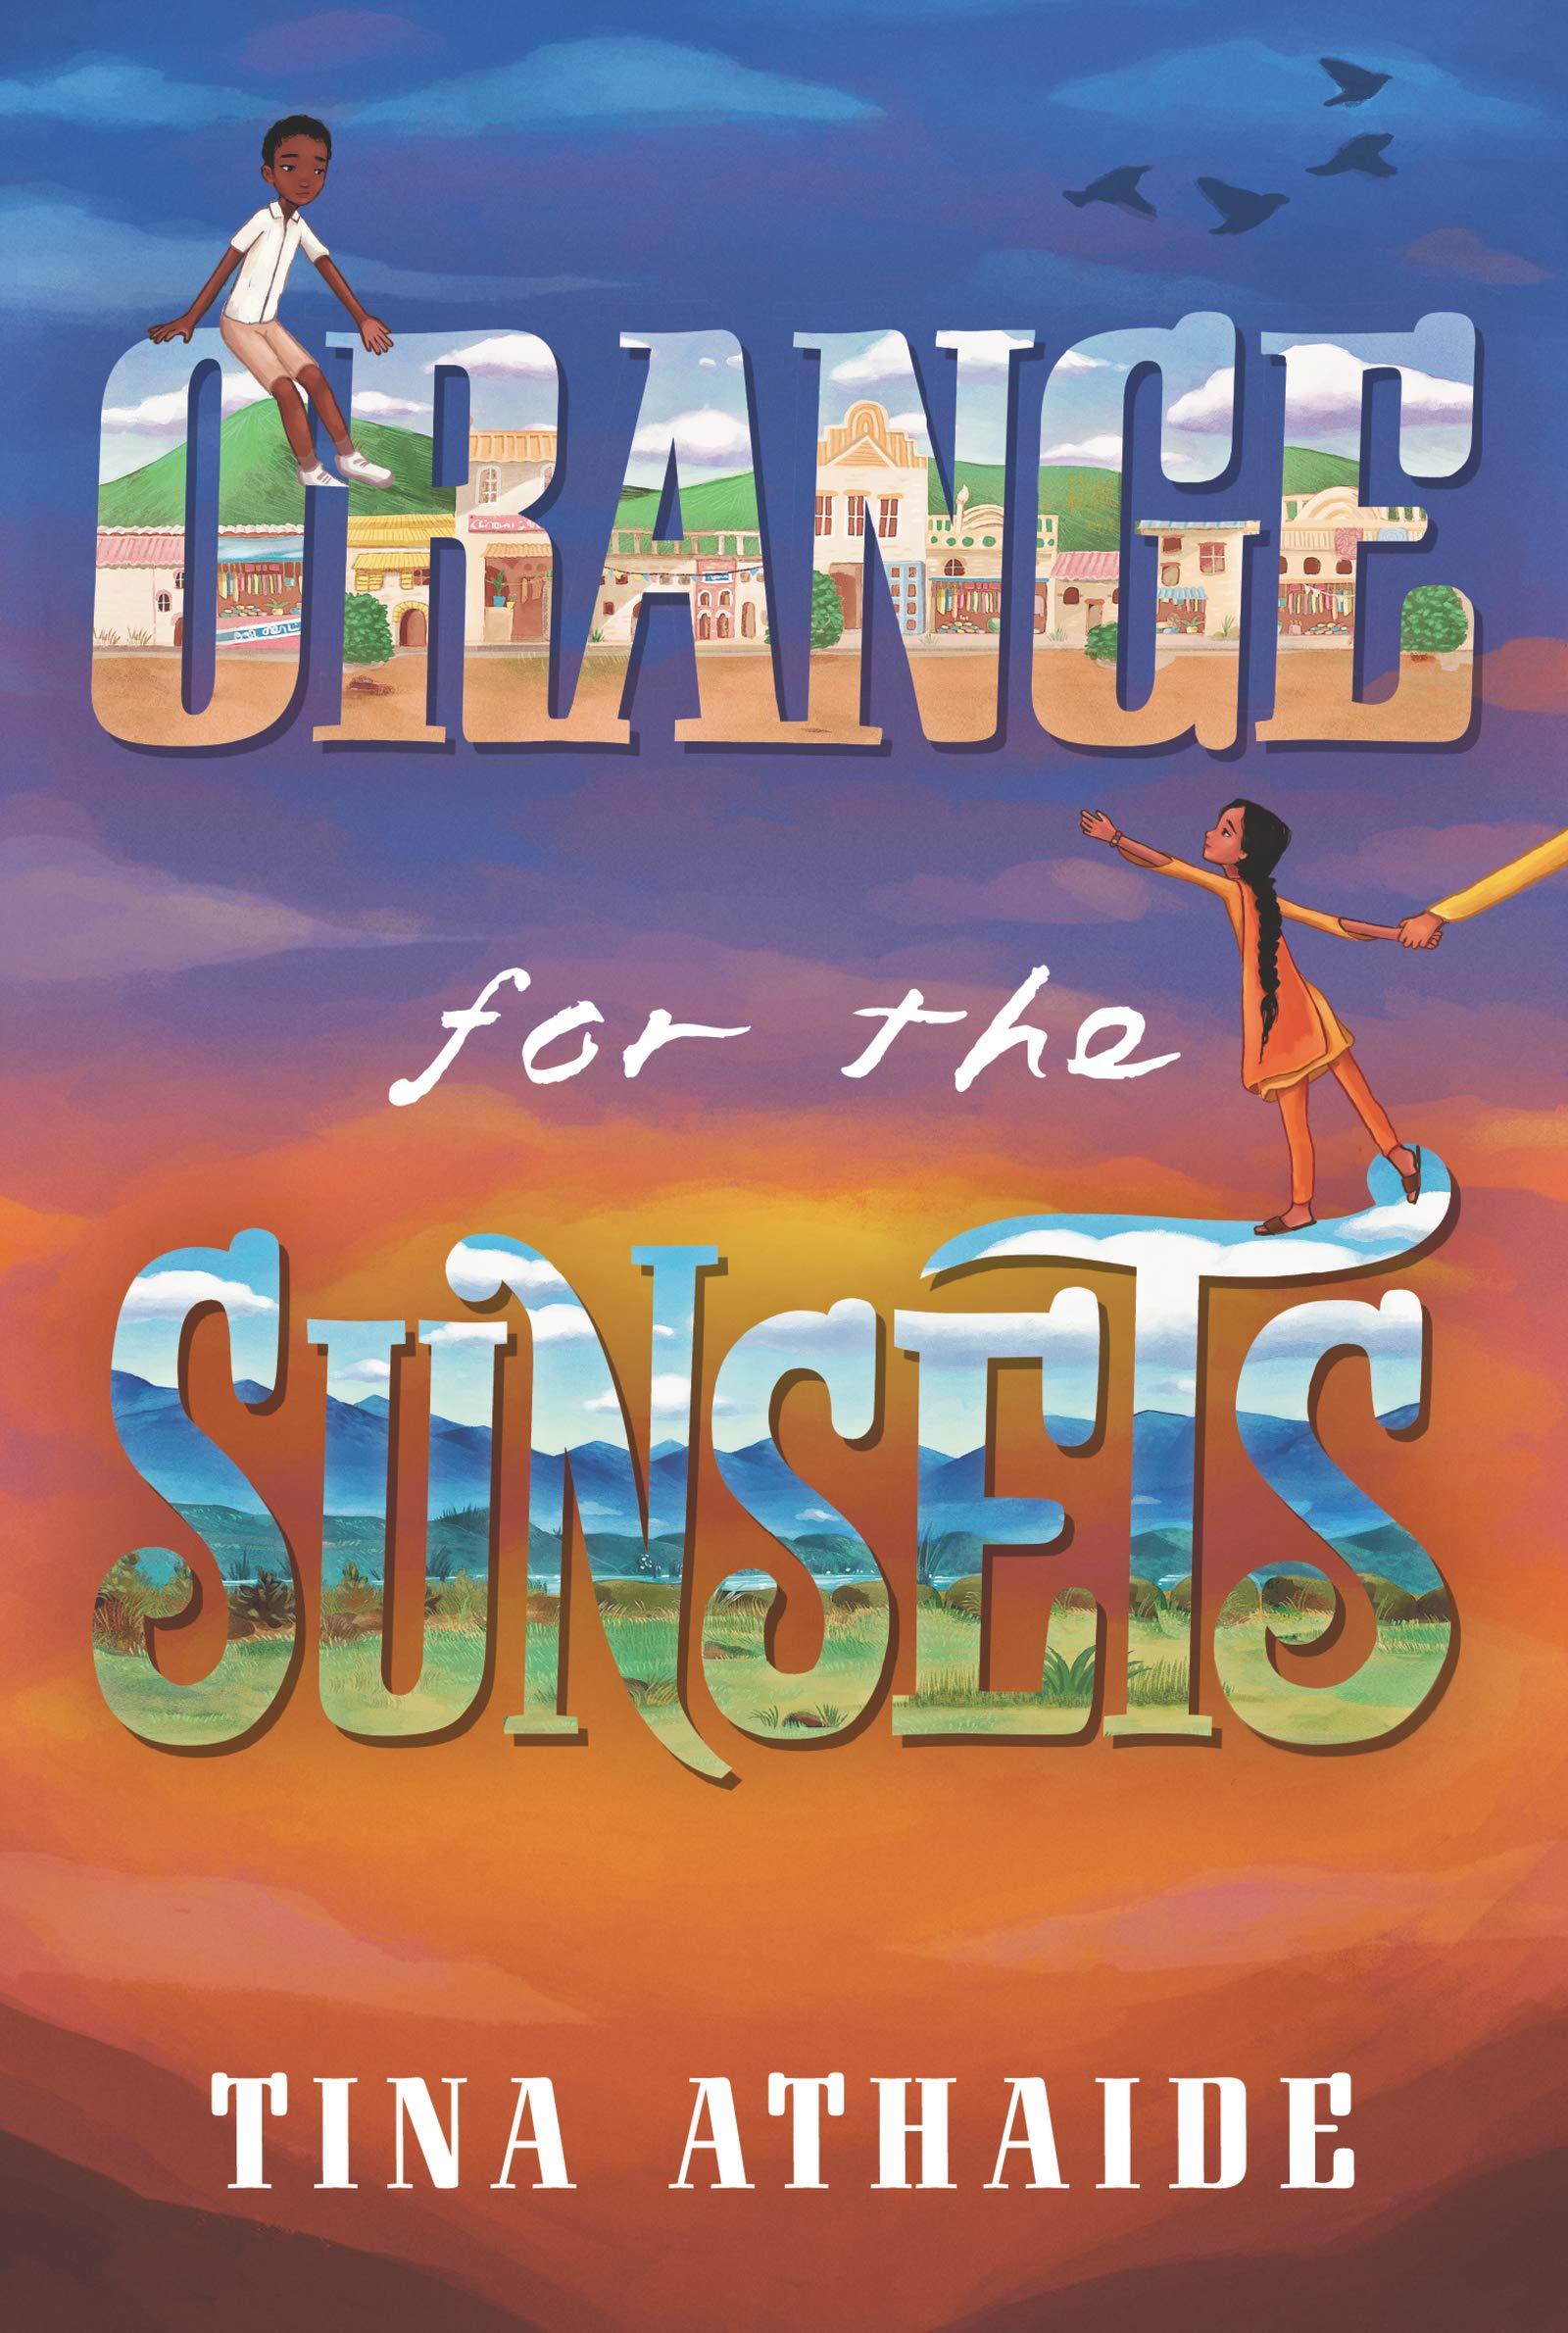 Orange for the Sunsets: Amazon.co.uk: Athaide, Tina: Books